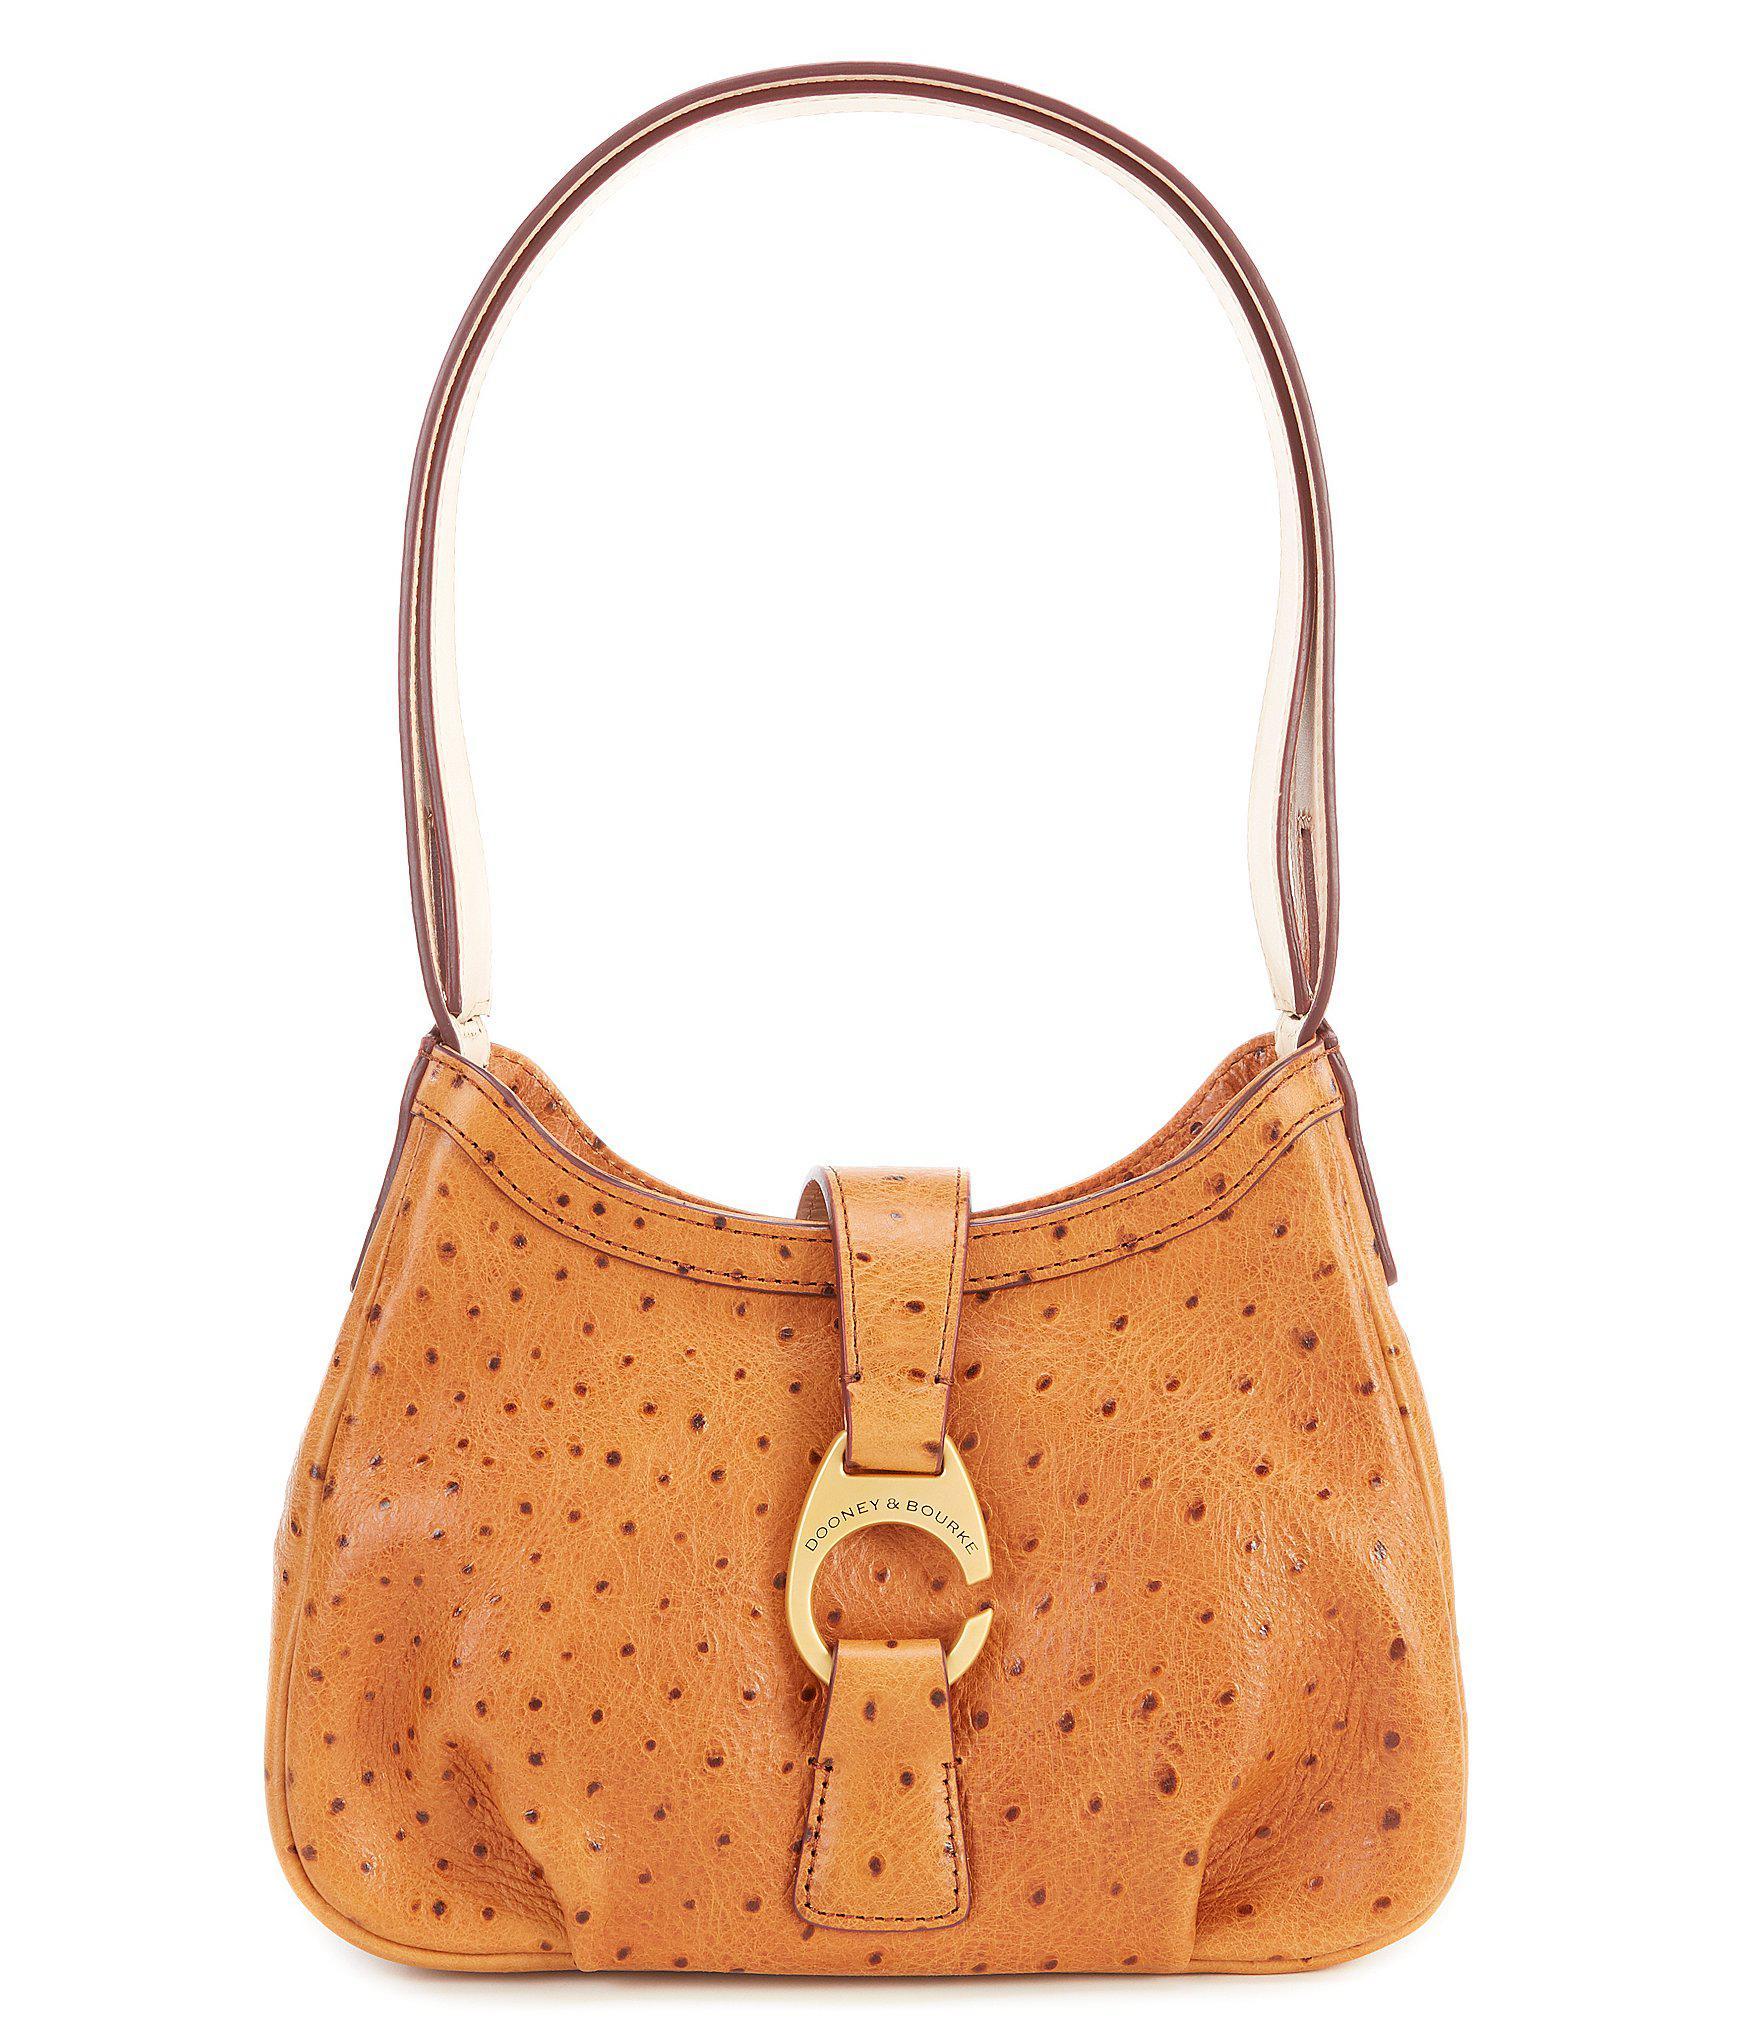 Lyst - Dooney   Bourke Derby Ostrich Collection Shoulder Bag in Natural e13890113522b